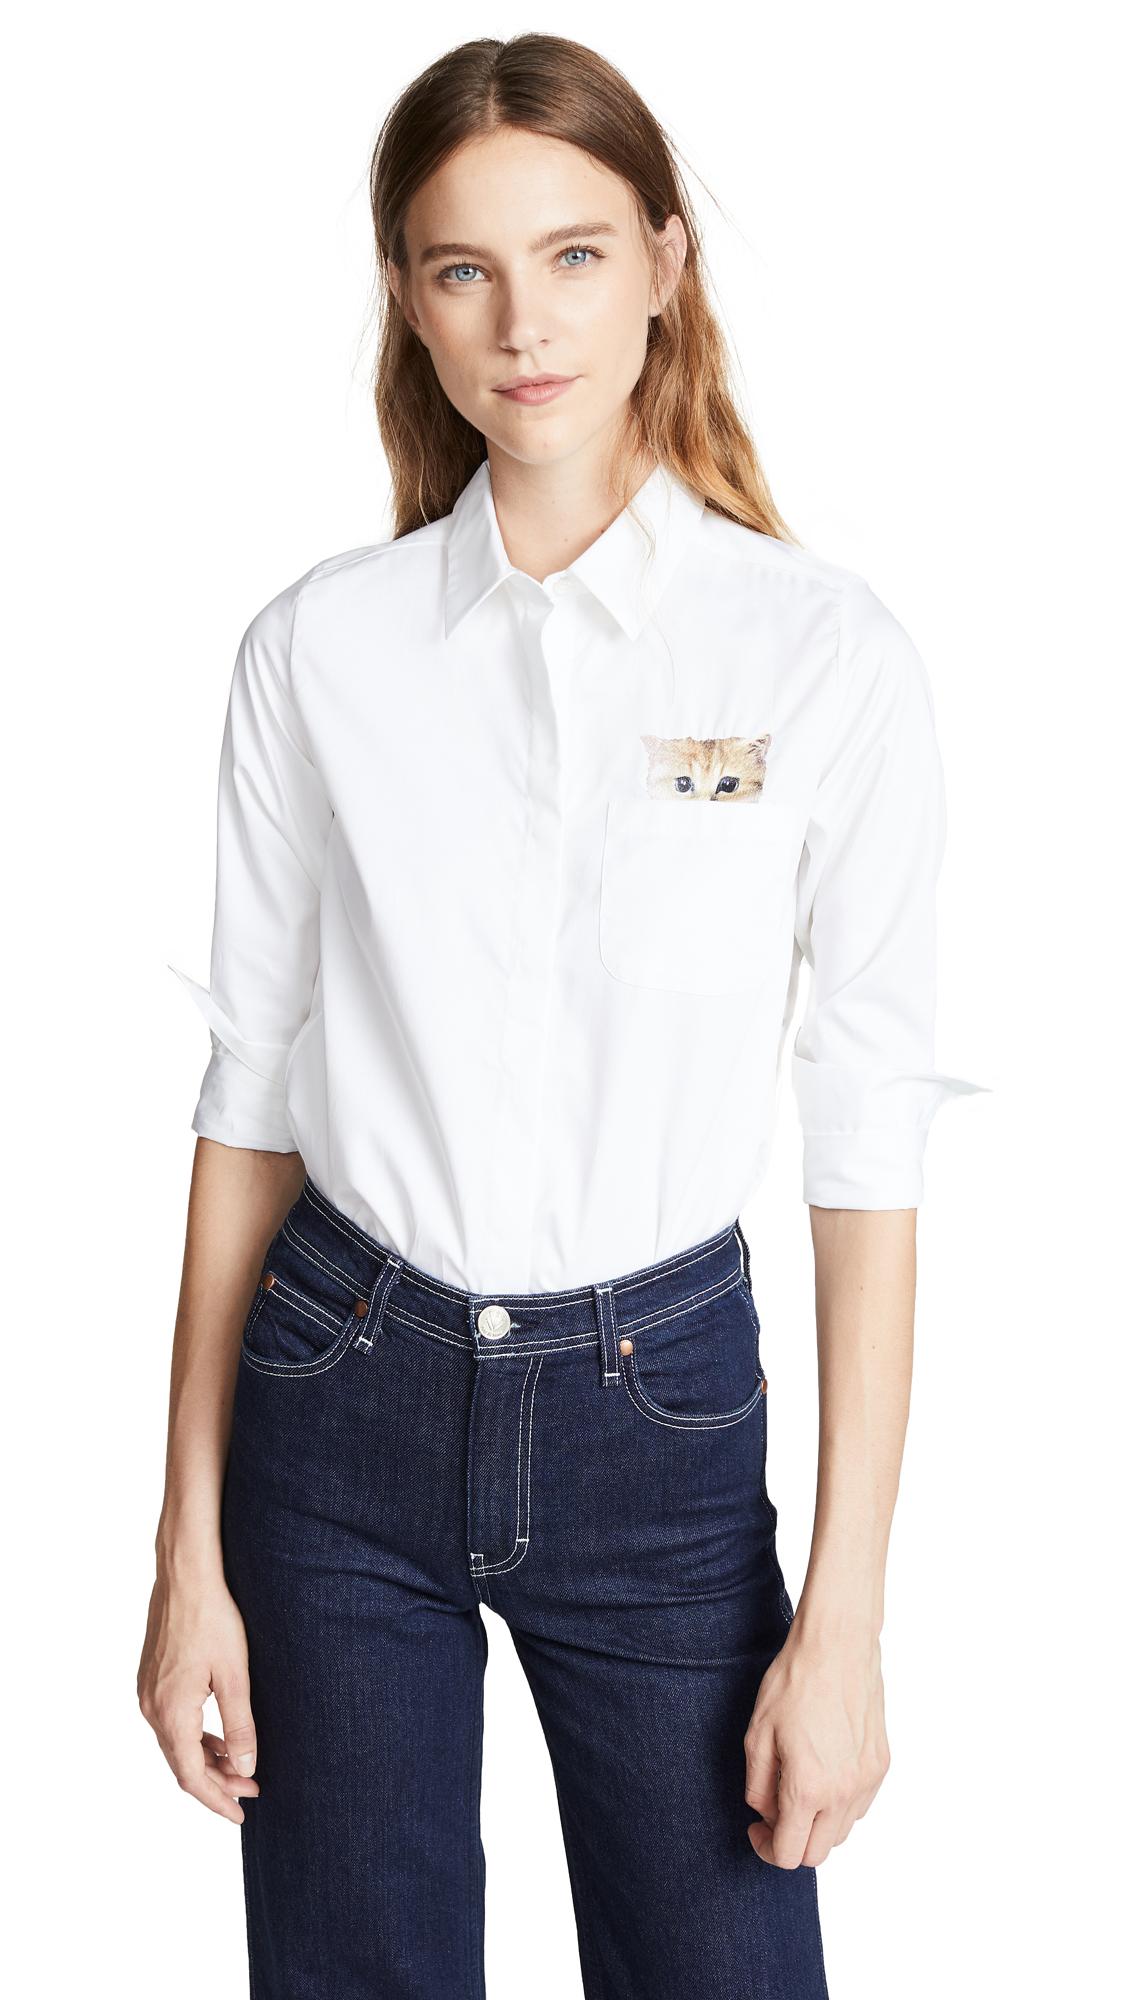 Paul & Joe Sister Leontine Button Down Shirt In Blanc